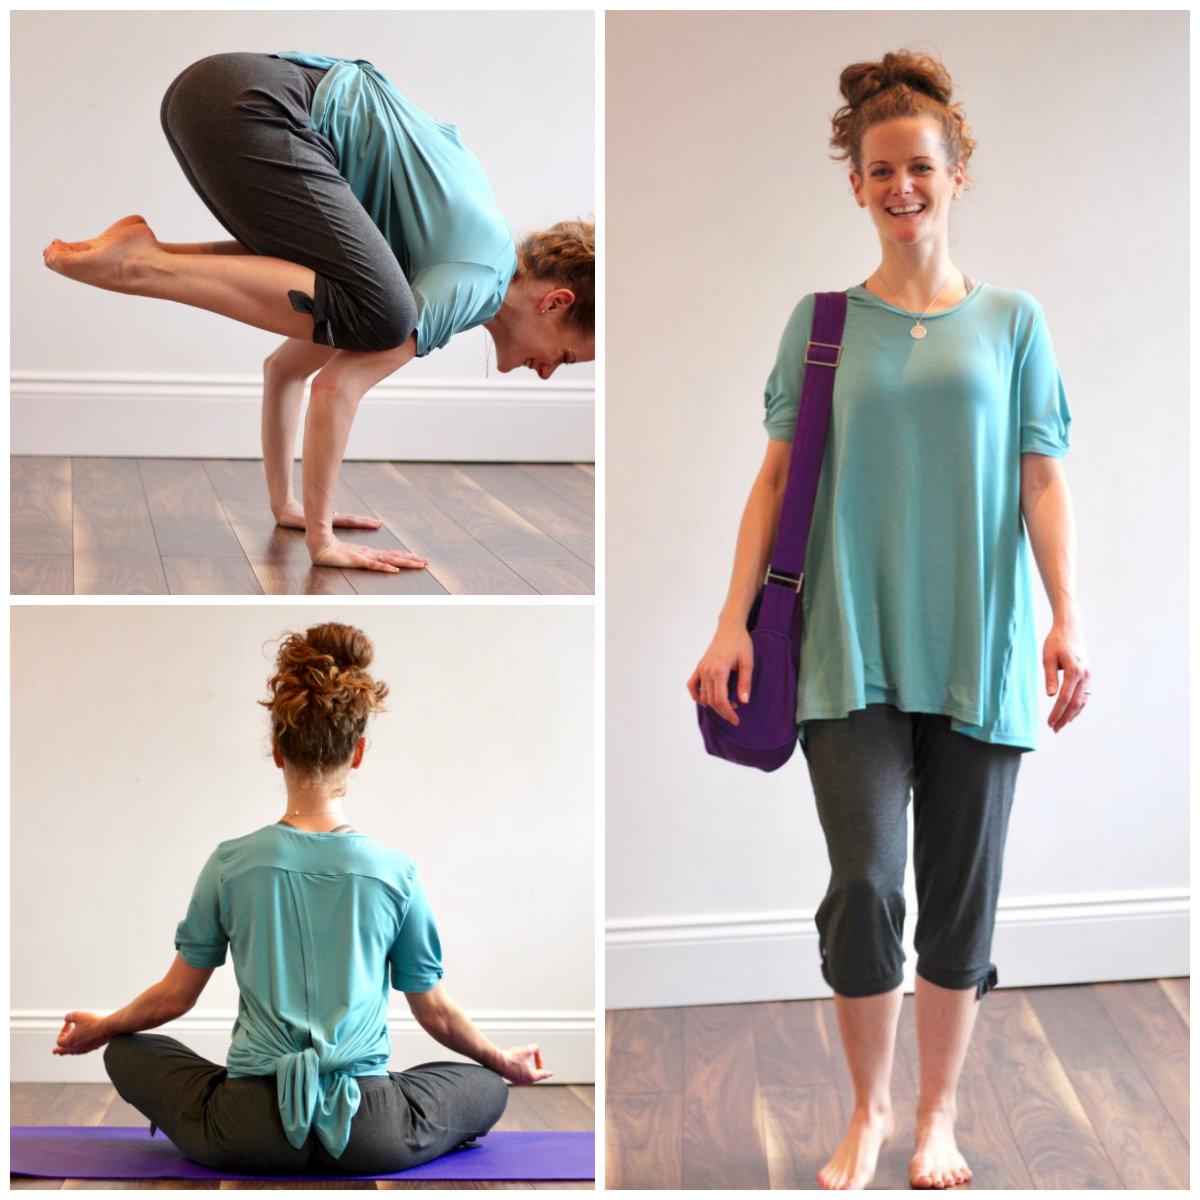 Fehr Trade 303 Knot-Maste Yoga Set Downloadable Pattern